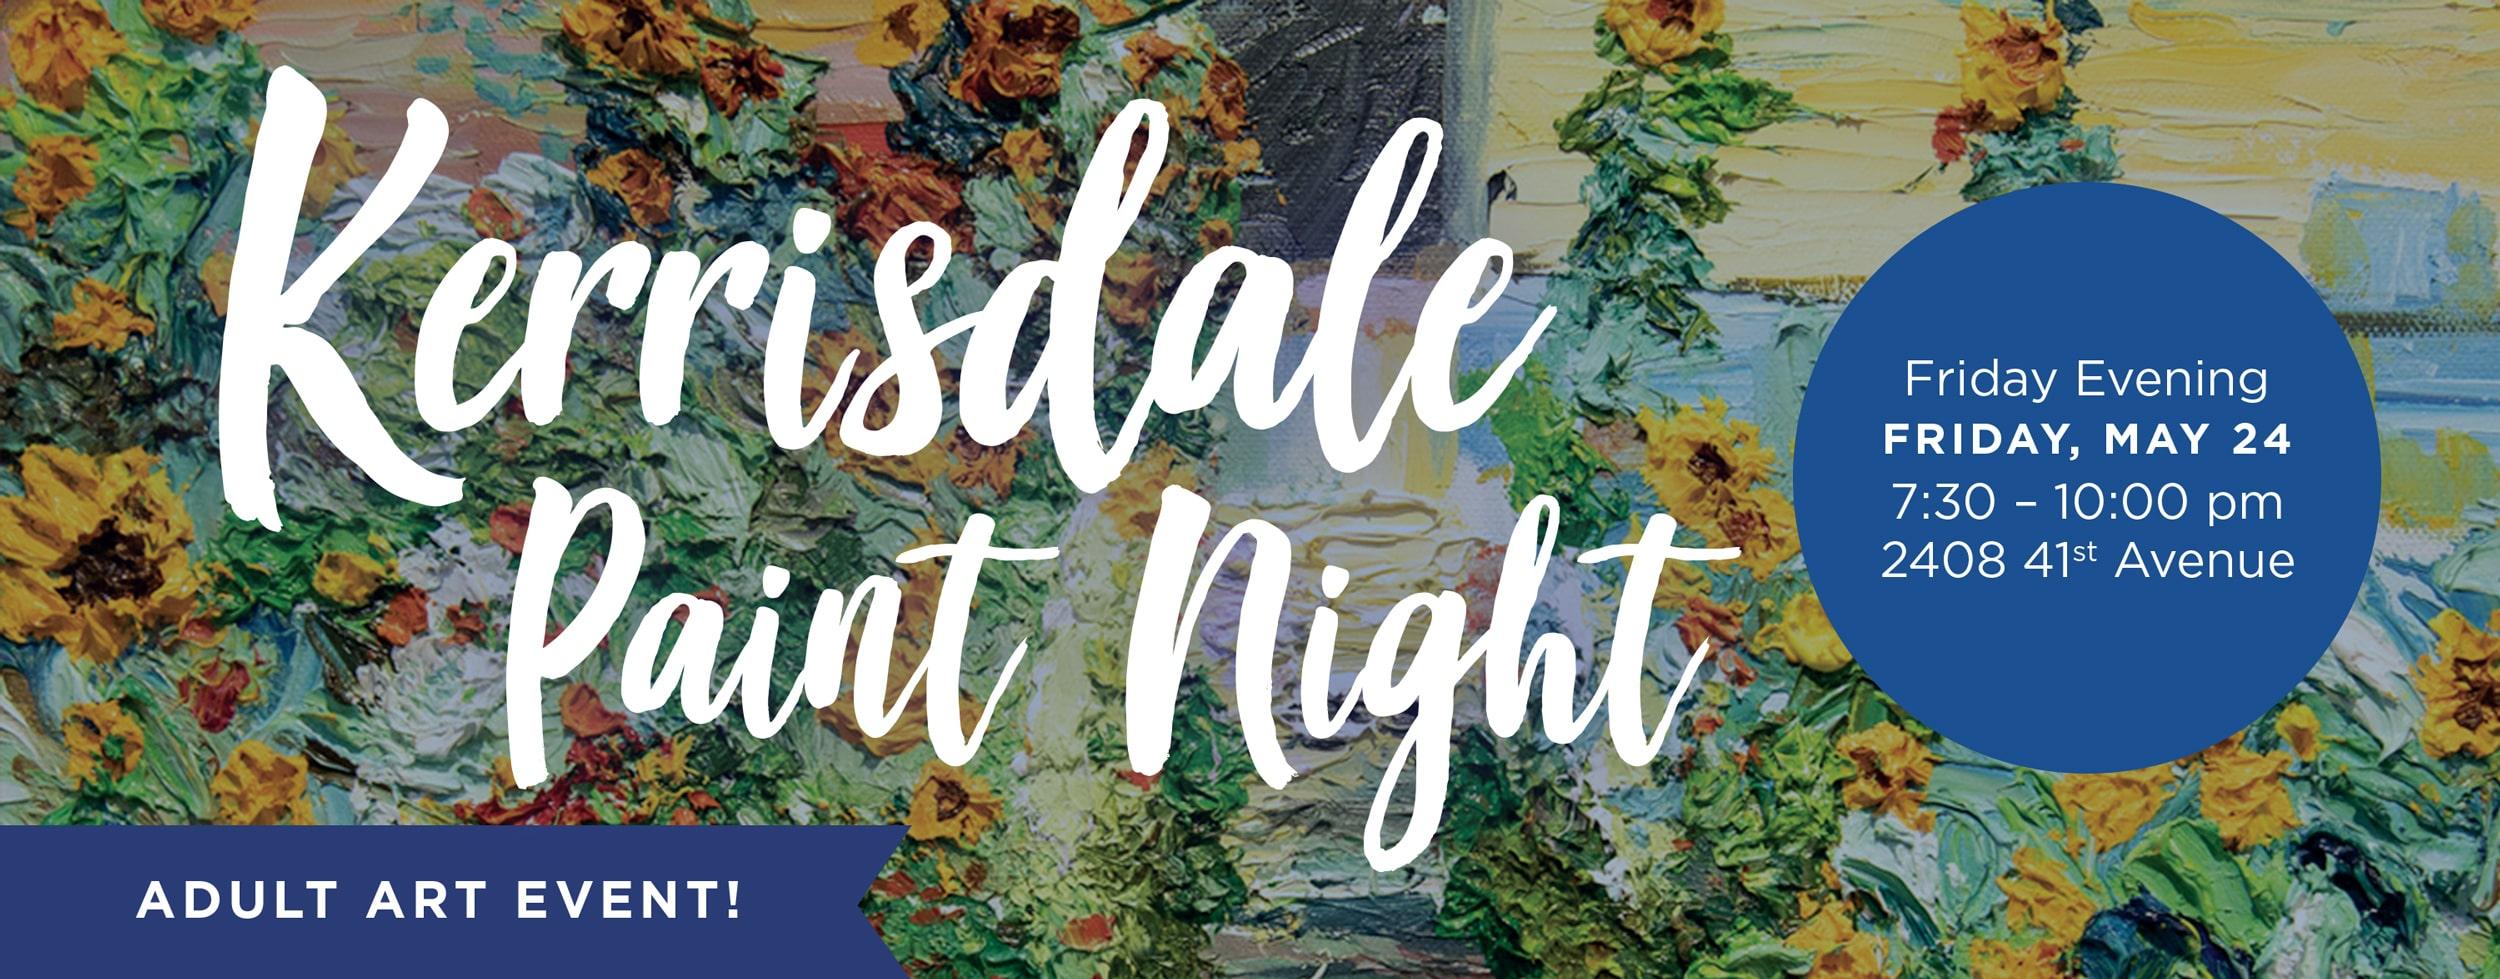 Kerrisdale Paint Night